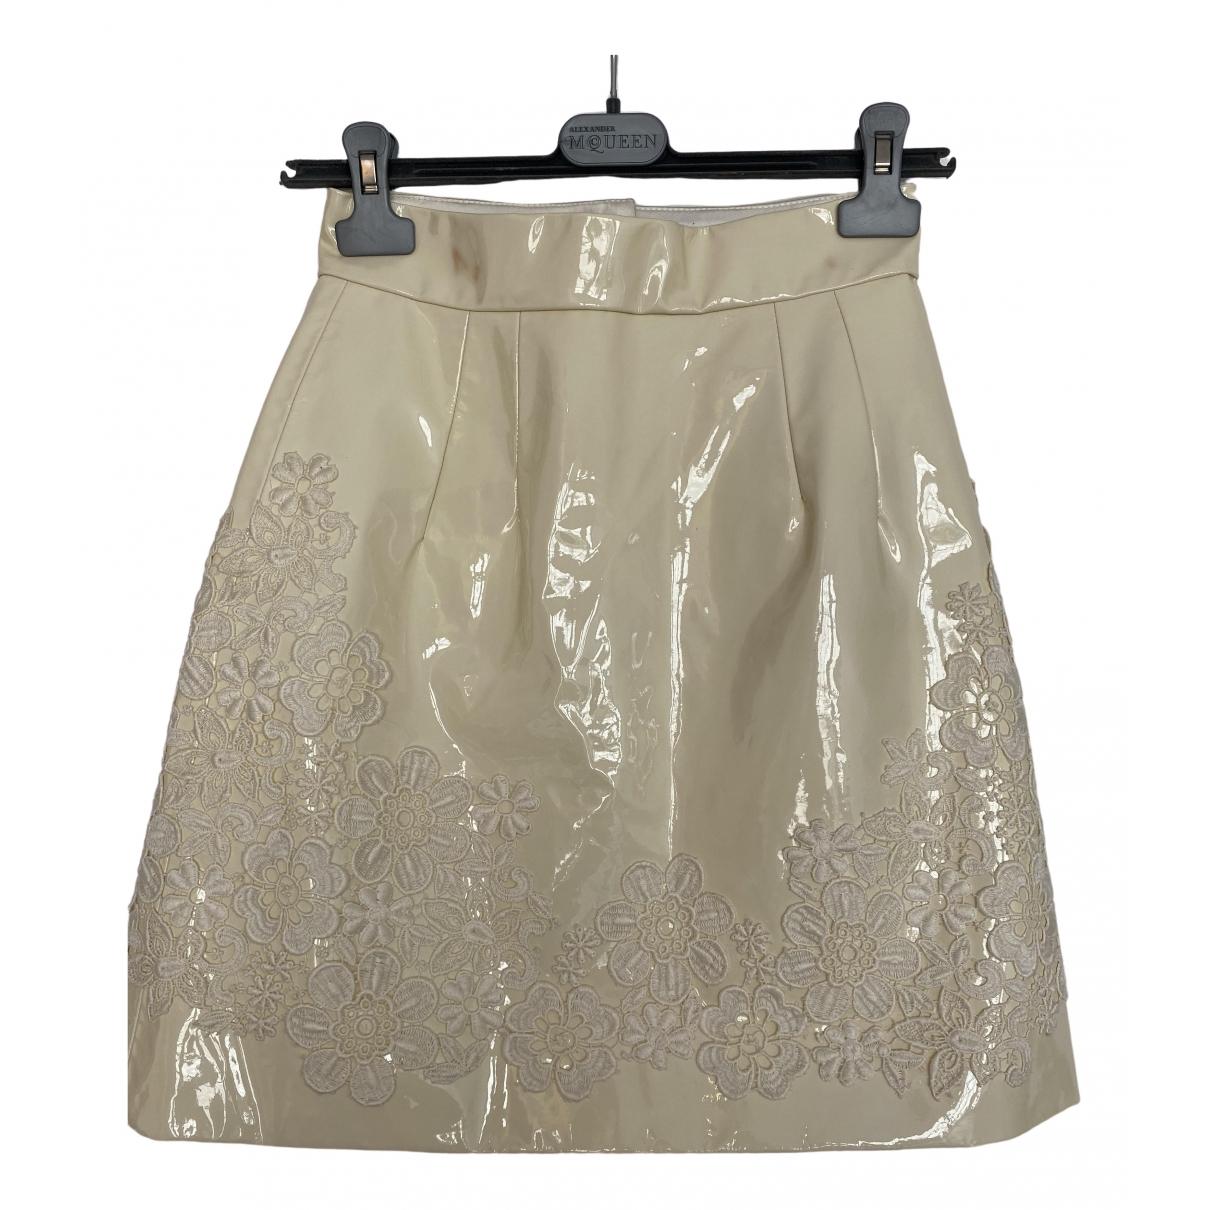 Mini falda de Charol Dolce & Gabbana